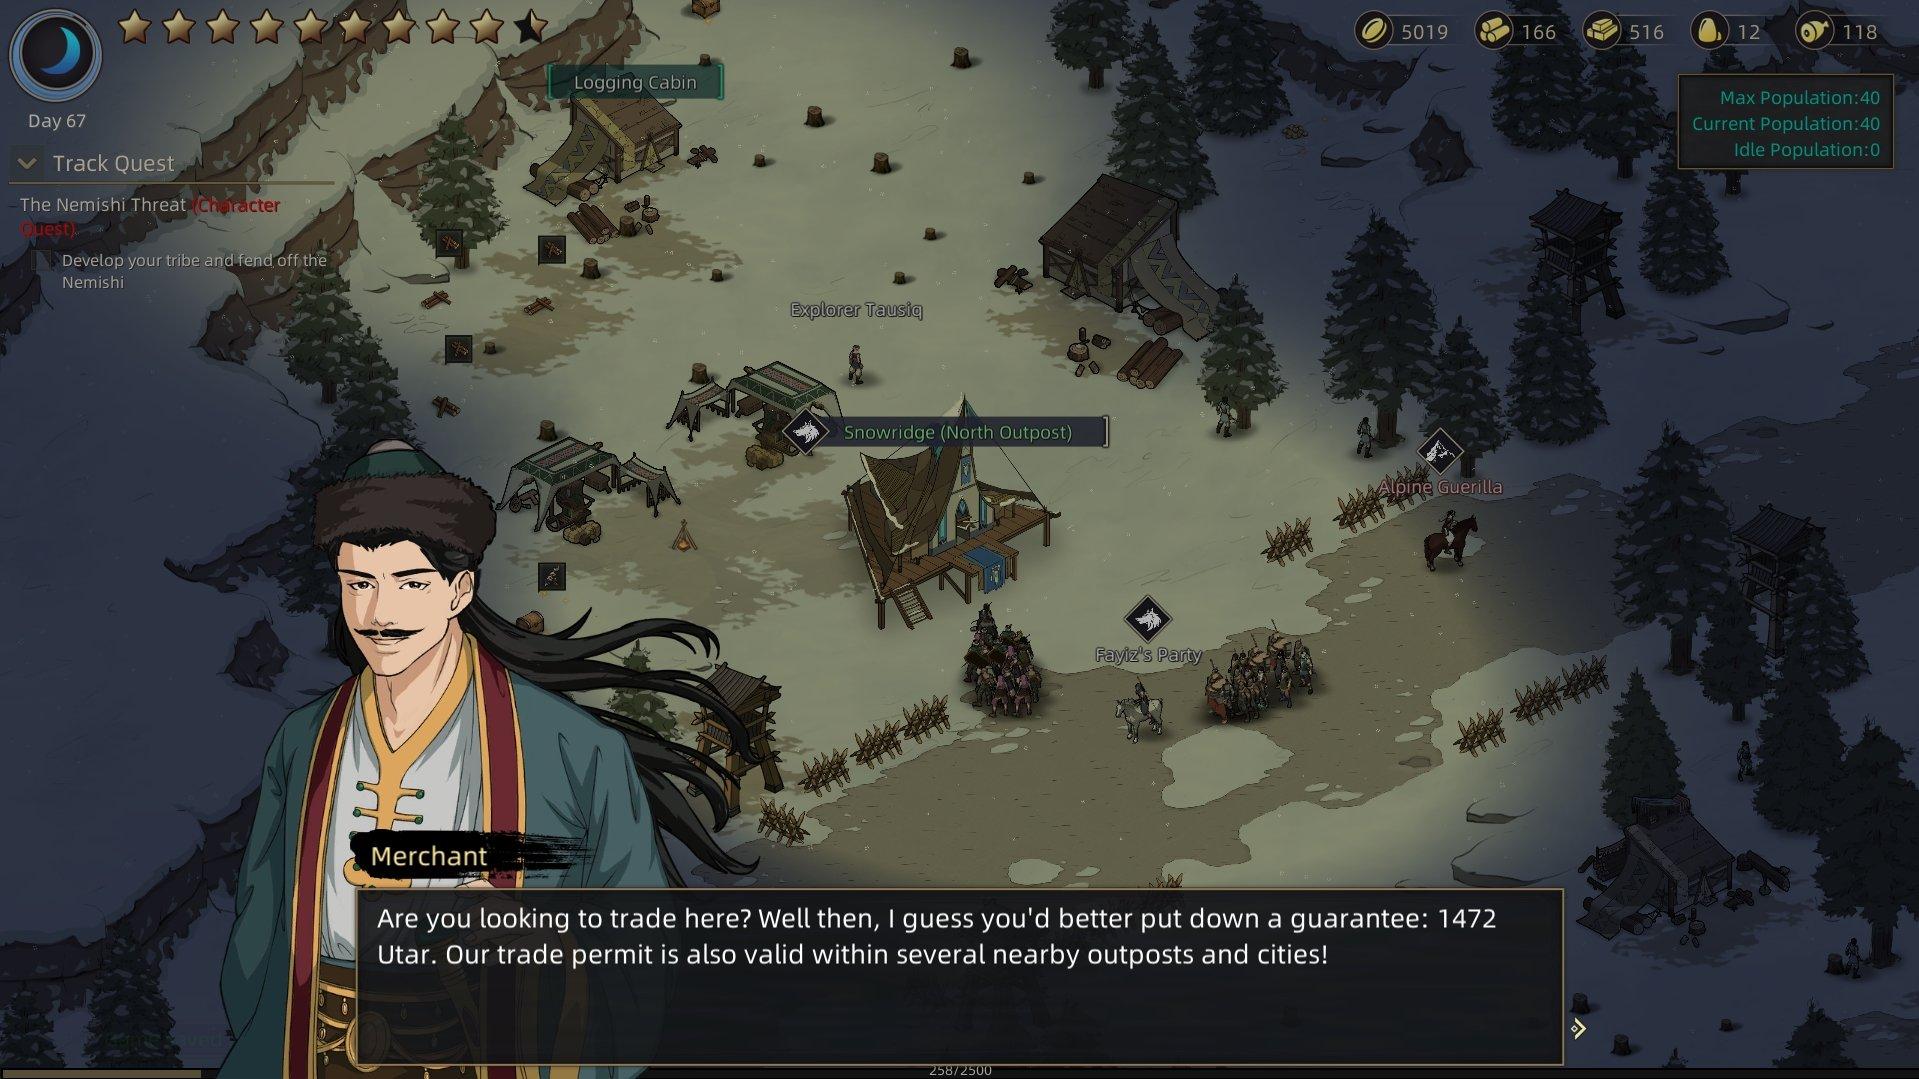 Sands of Salzaar - Trading Items Merchant